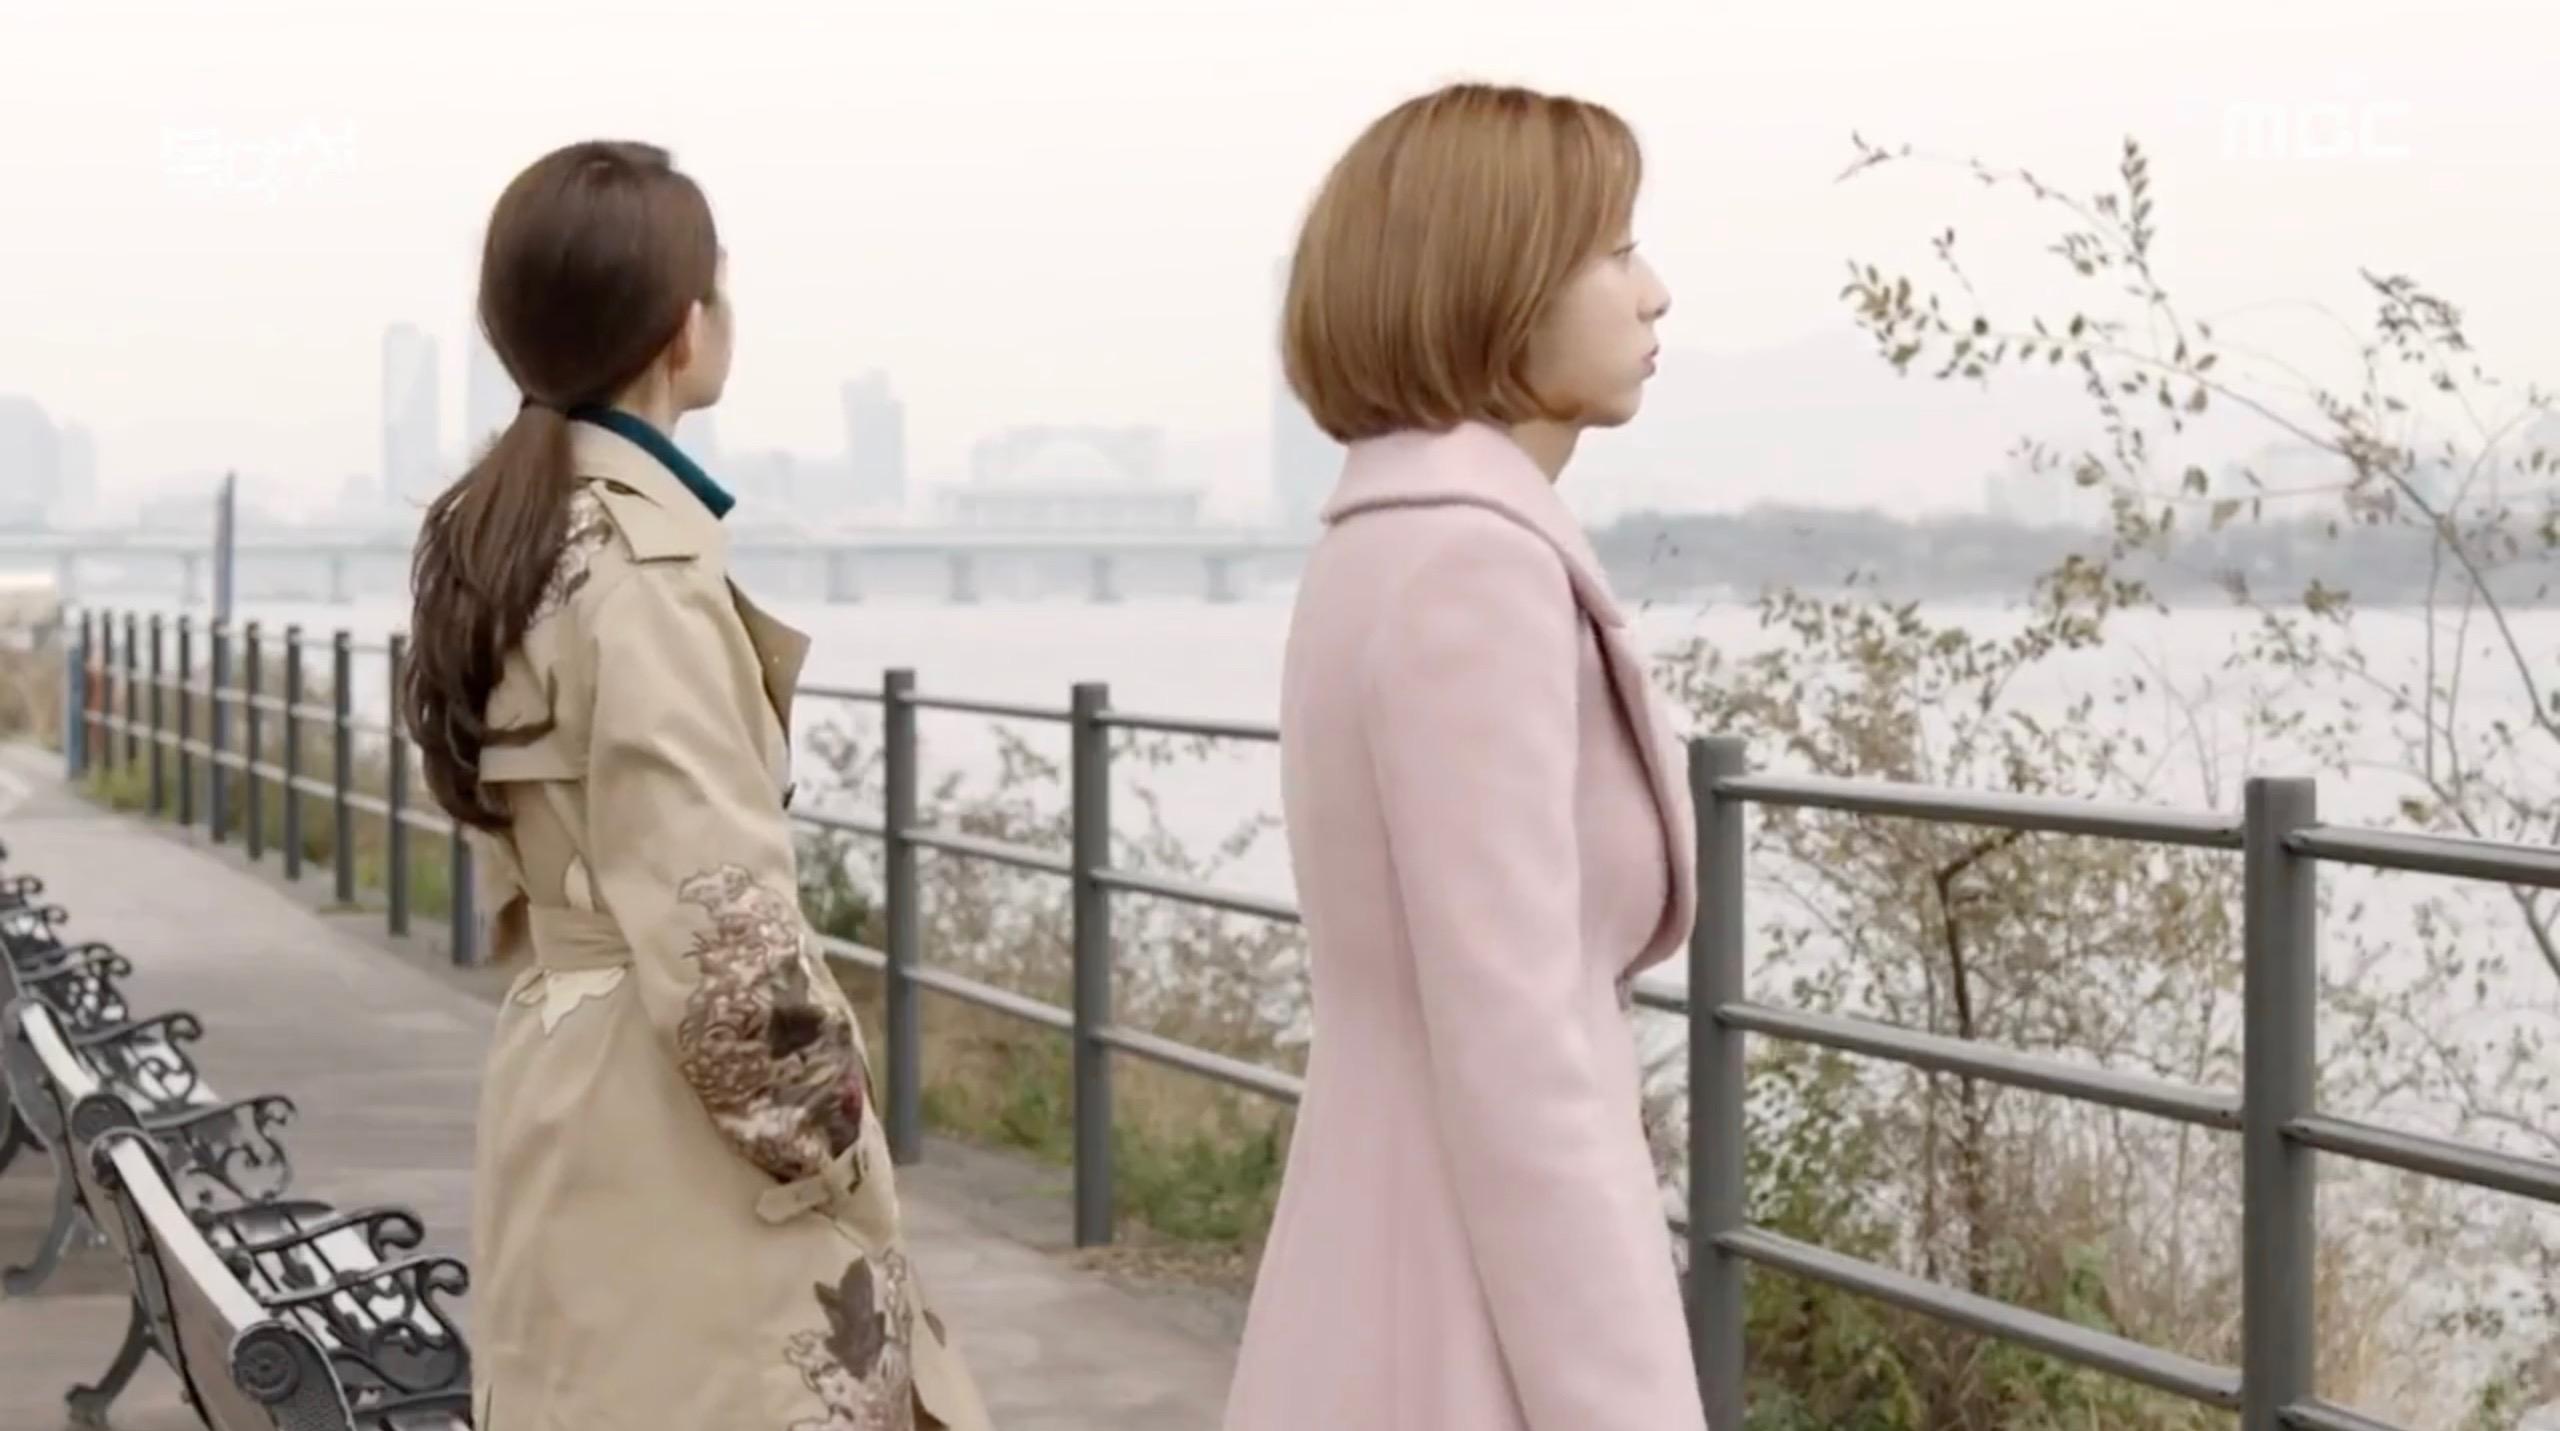 Night light korean drama synopsis - Photo Gallery All Photos 14